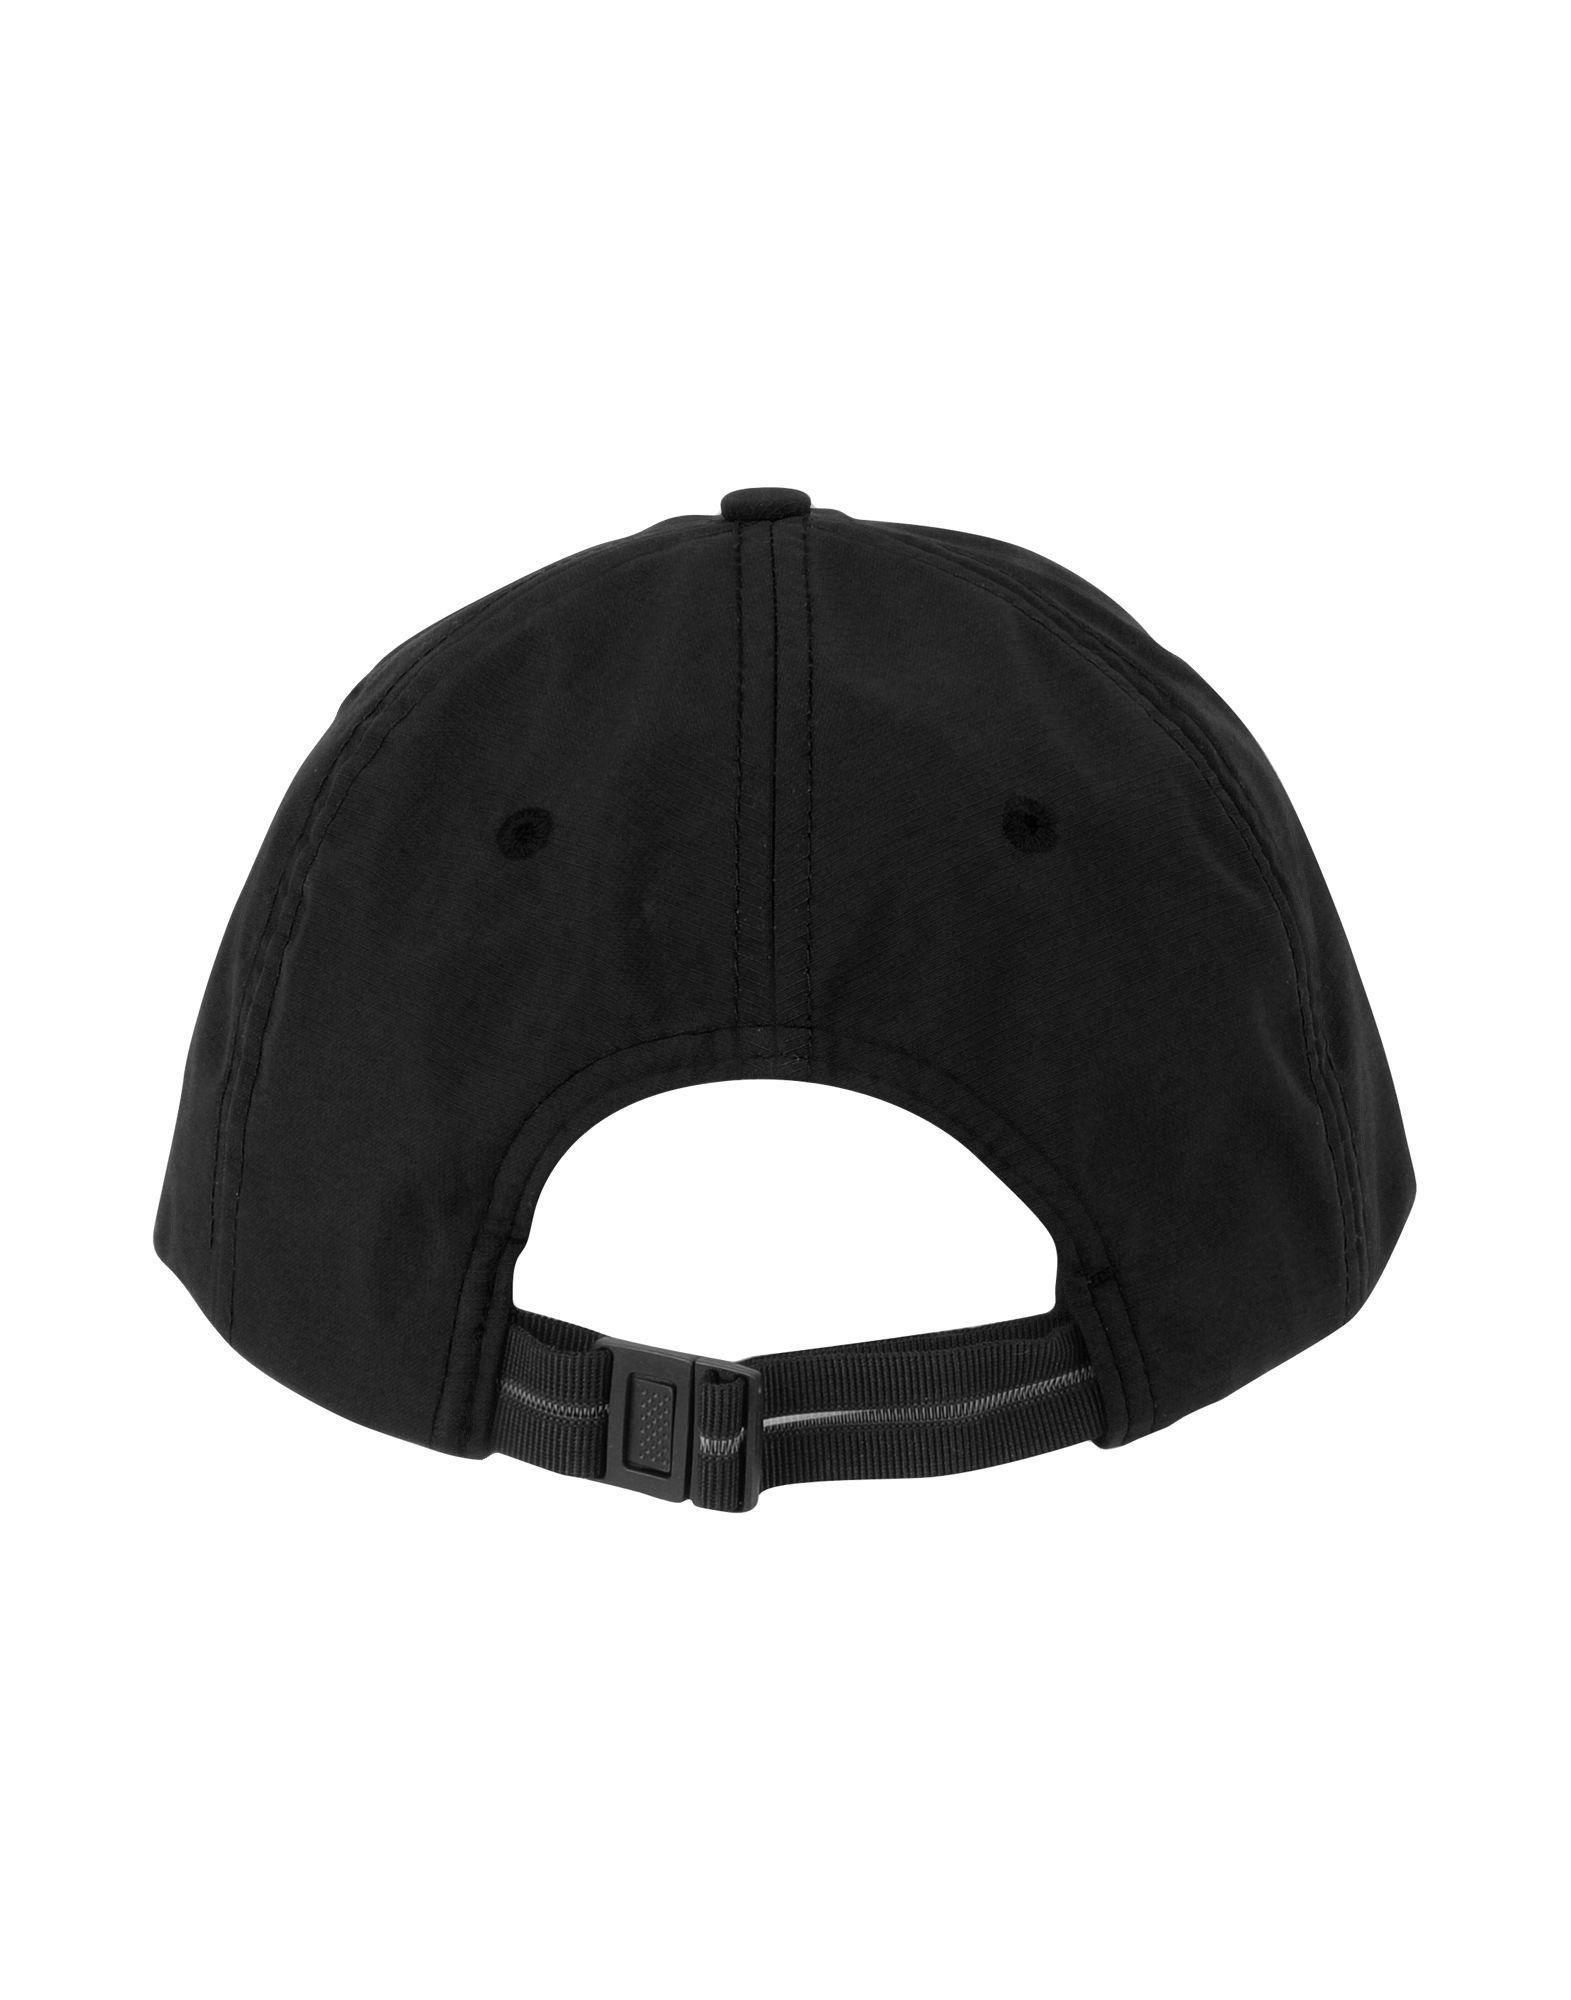 Lyst - Mki Miyuki-Zoku Hat in Black for Men 0acbf1a29f8d